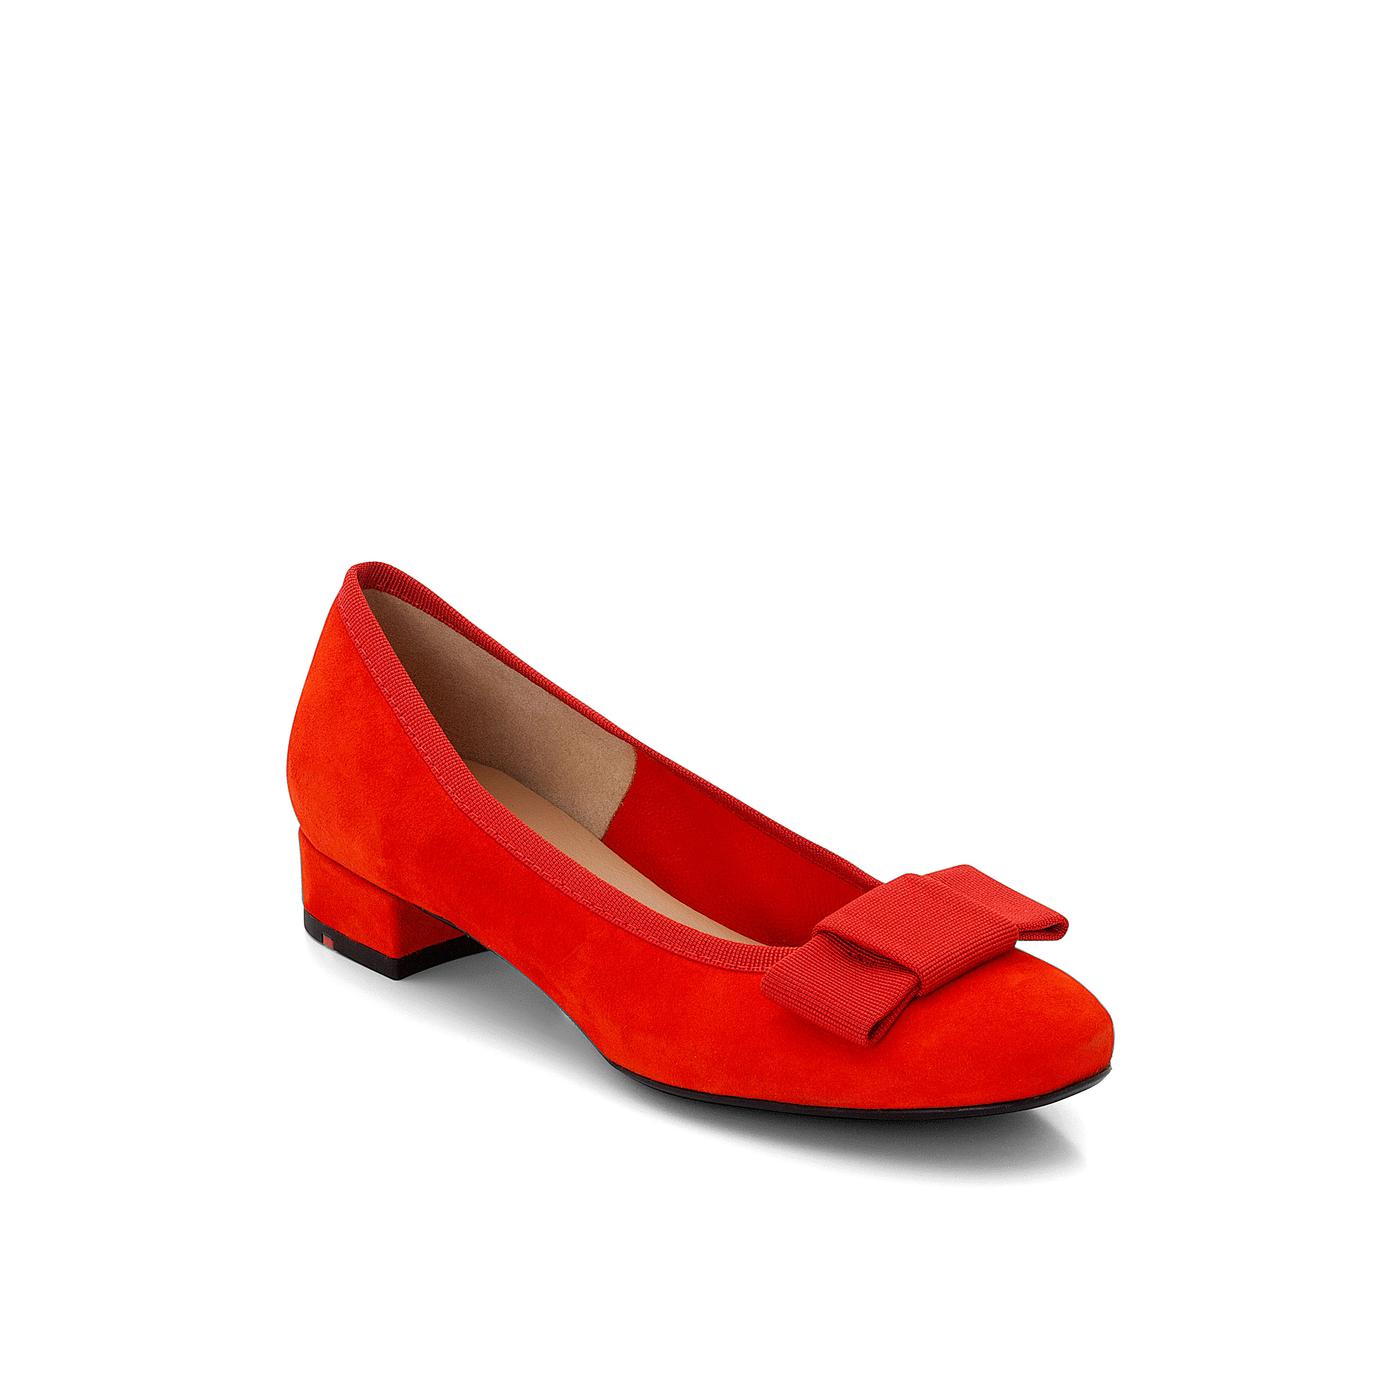 BALLERINA | Schuhe > Ballerinas | Rot | Rauleder -  futterlos | LLOYD